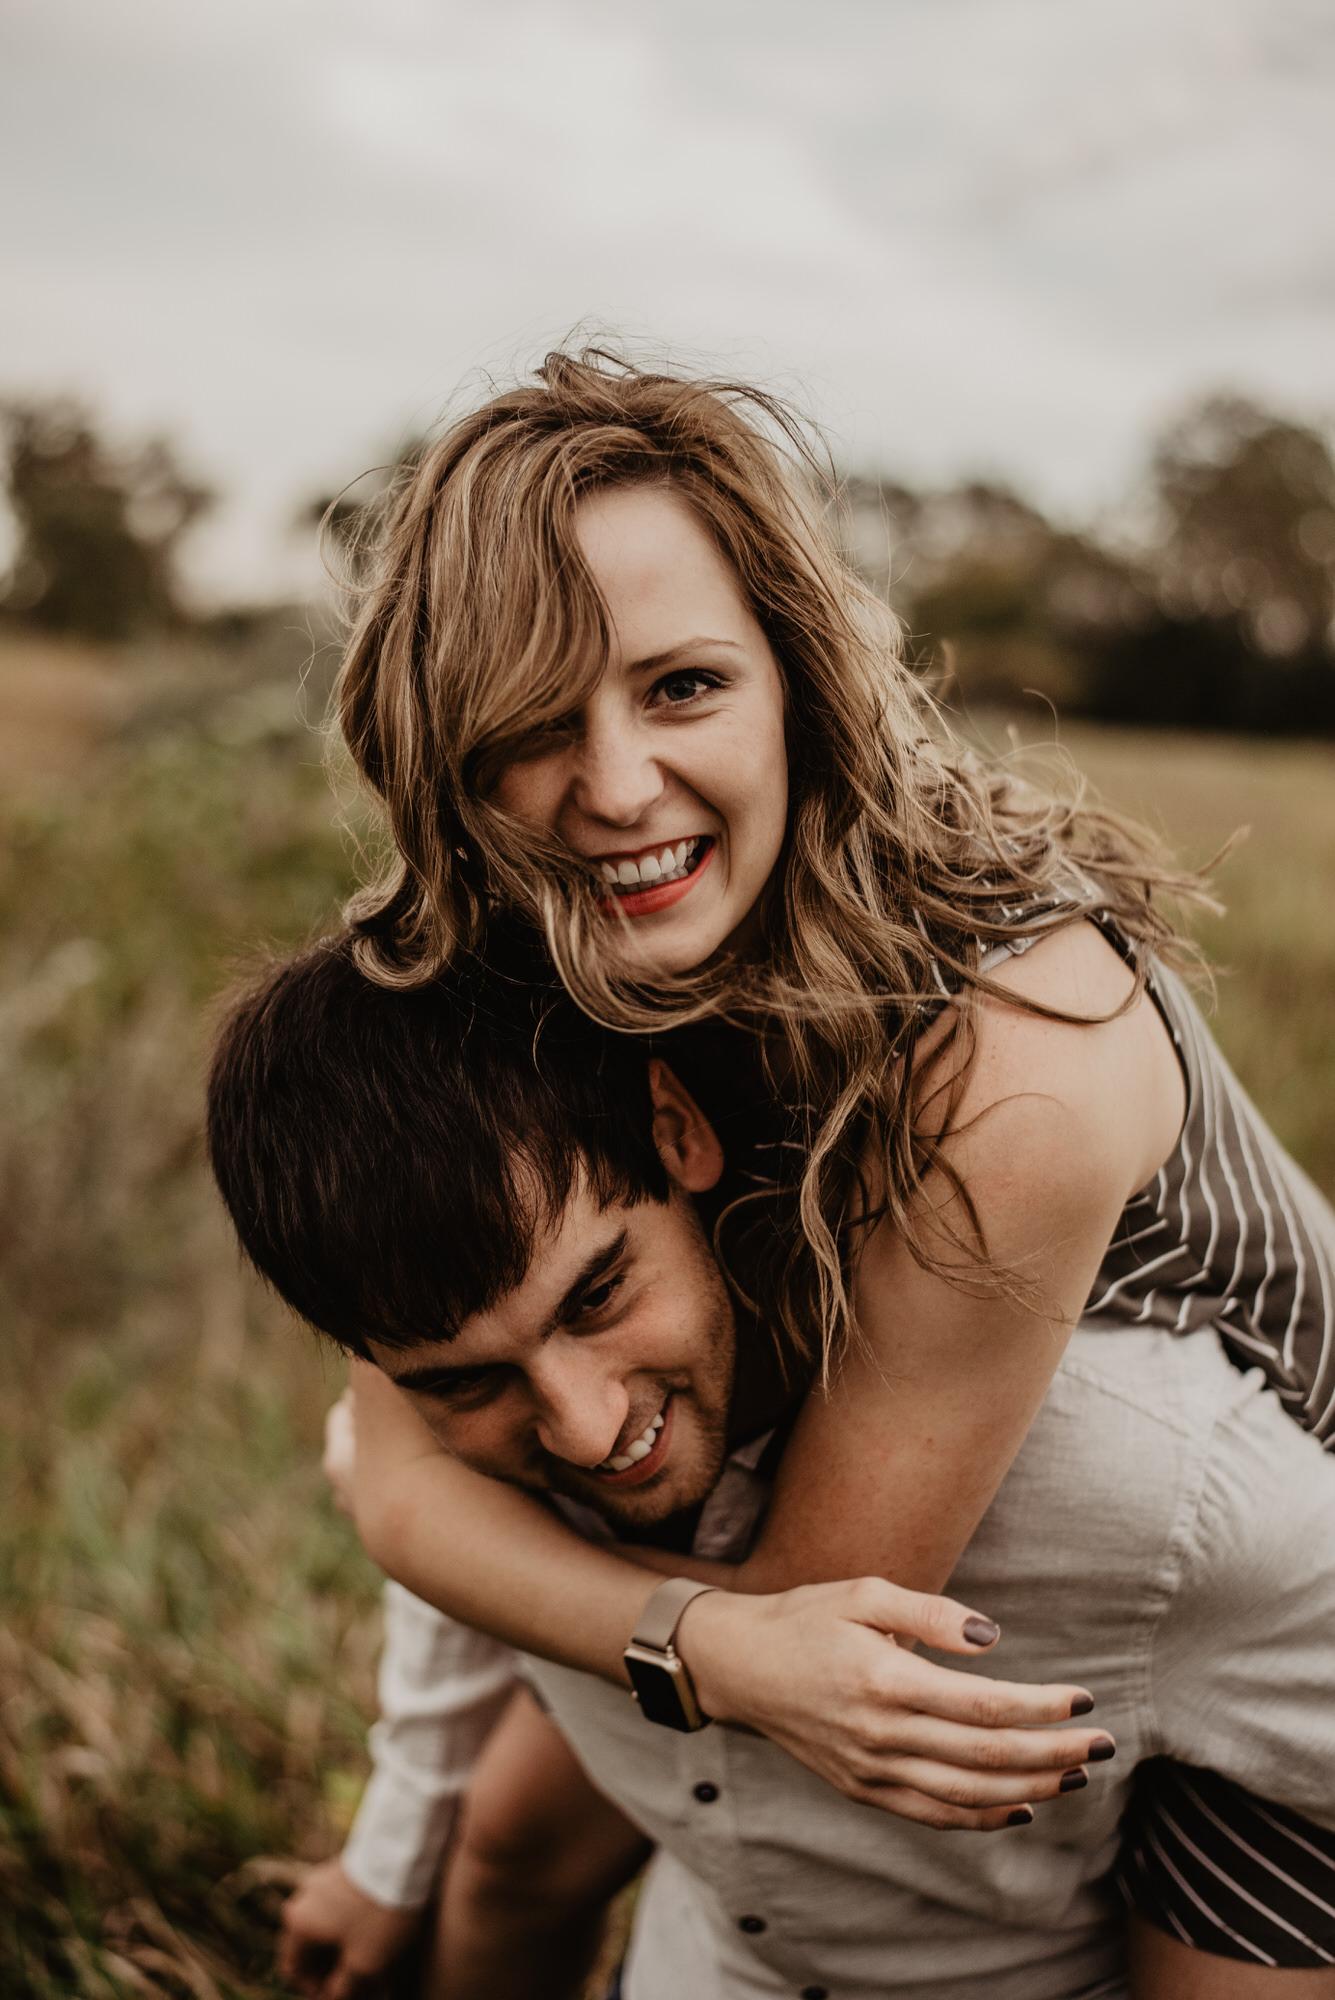 Kaylie-Sirek-Photography-wedding-engagement-photographer-Grand-Island-Kearney-Hastings-Lincoln-Nebraska-central-midwest-moments-trump-posing-natural-light-engaged-09.jpg